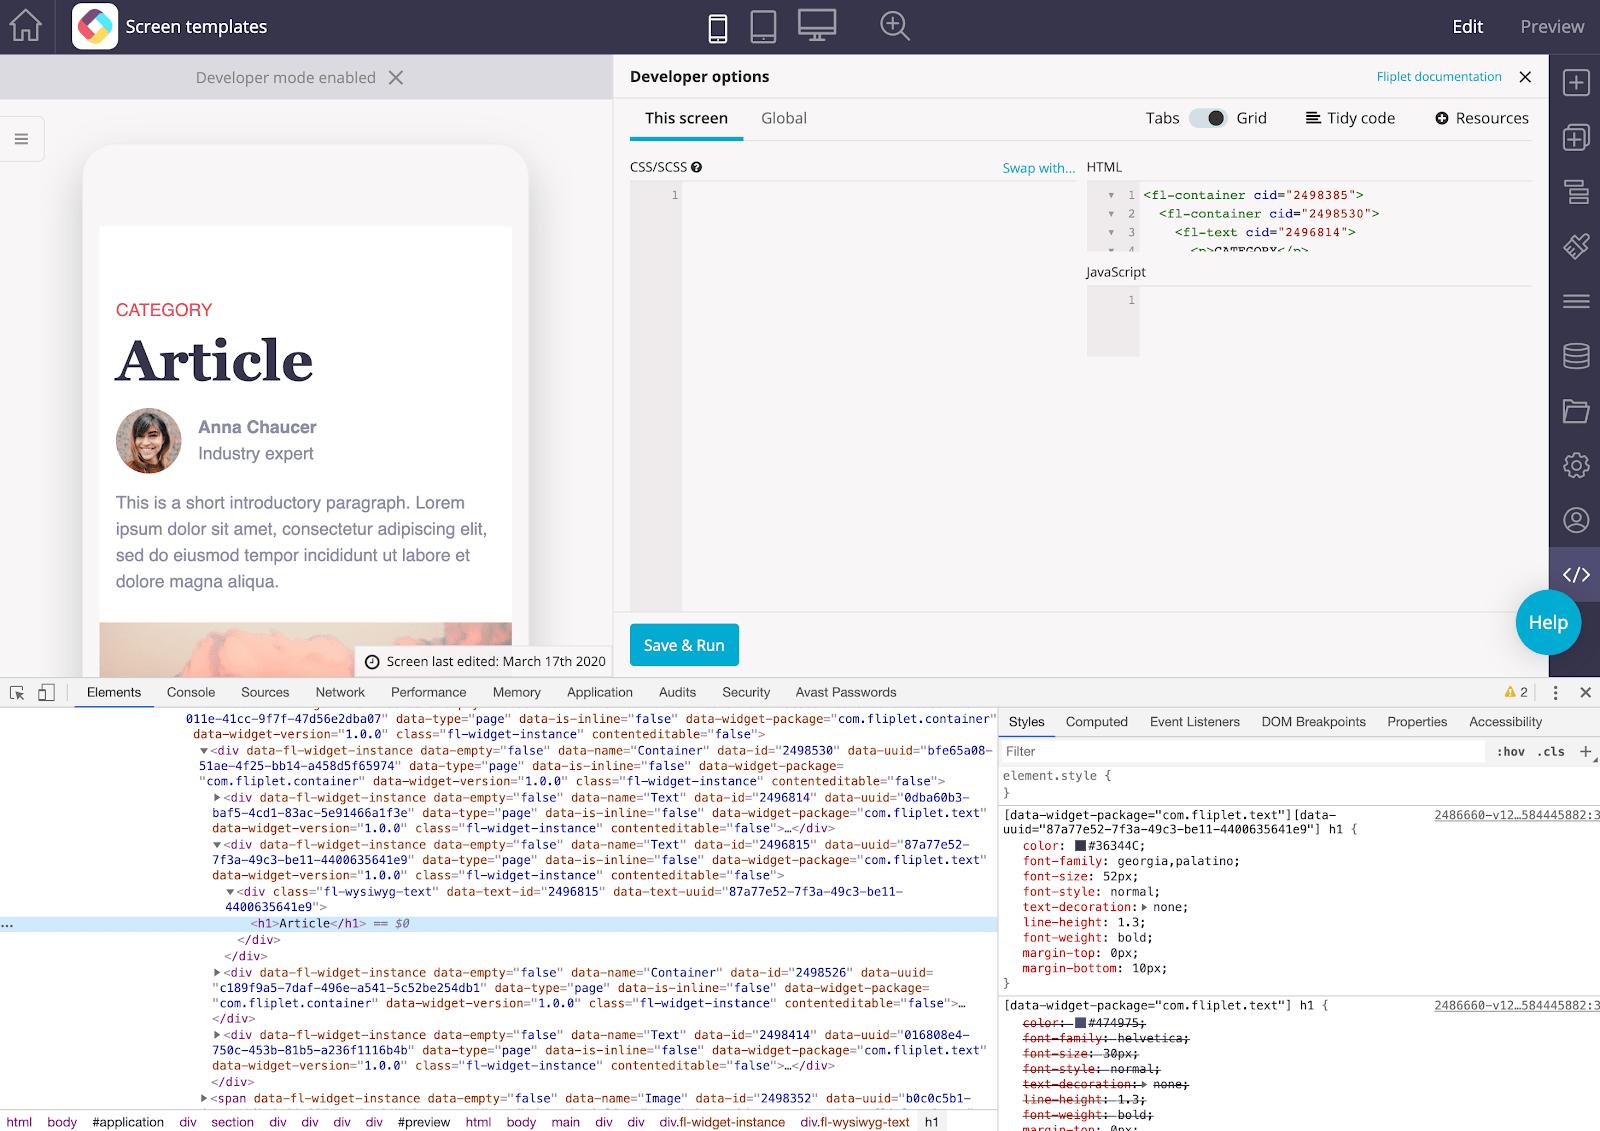 Fliplet Studio Developers